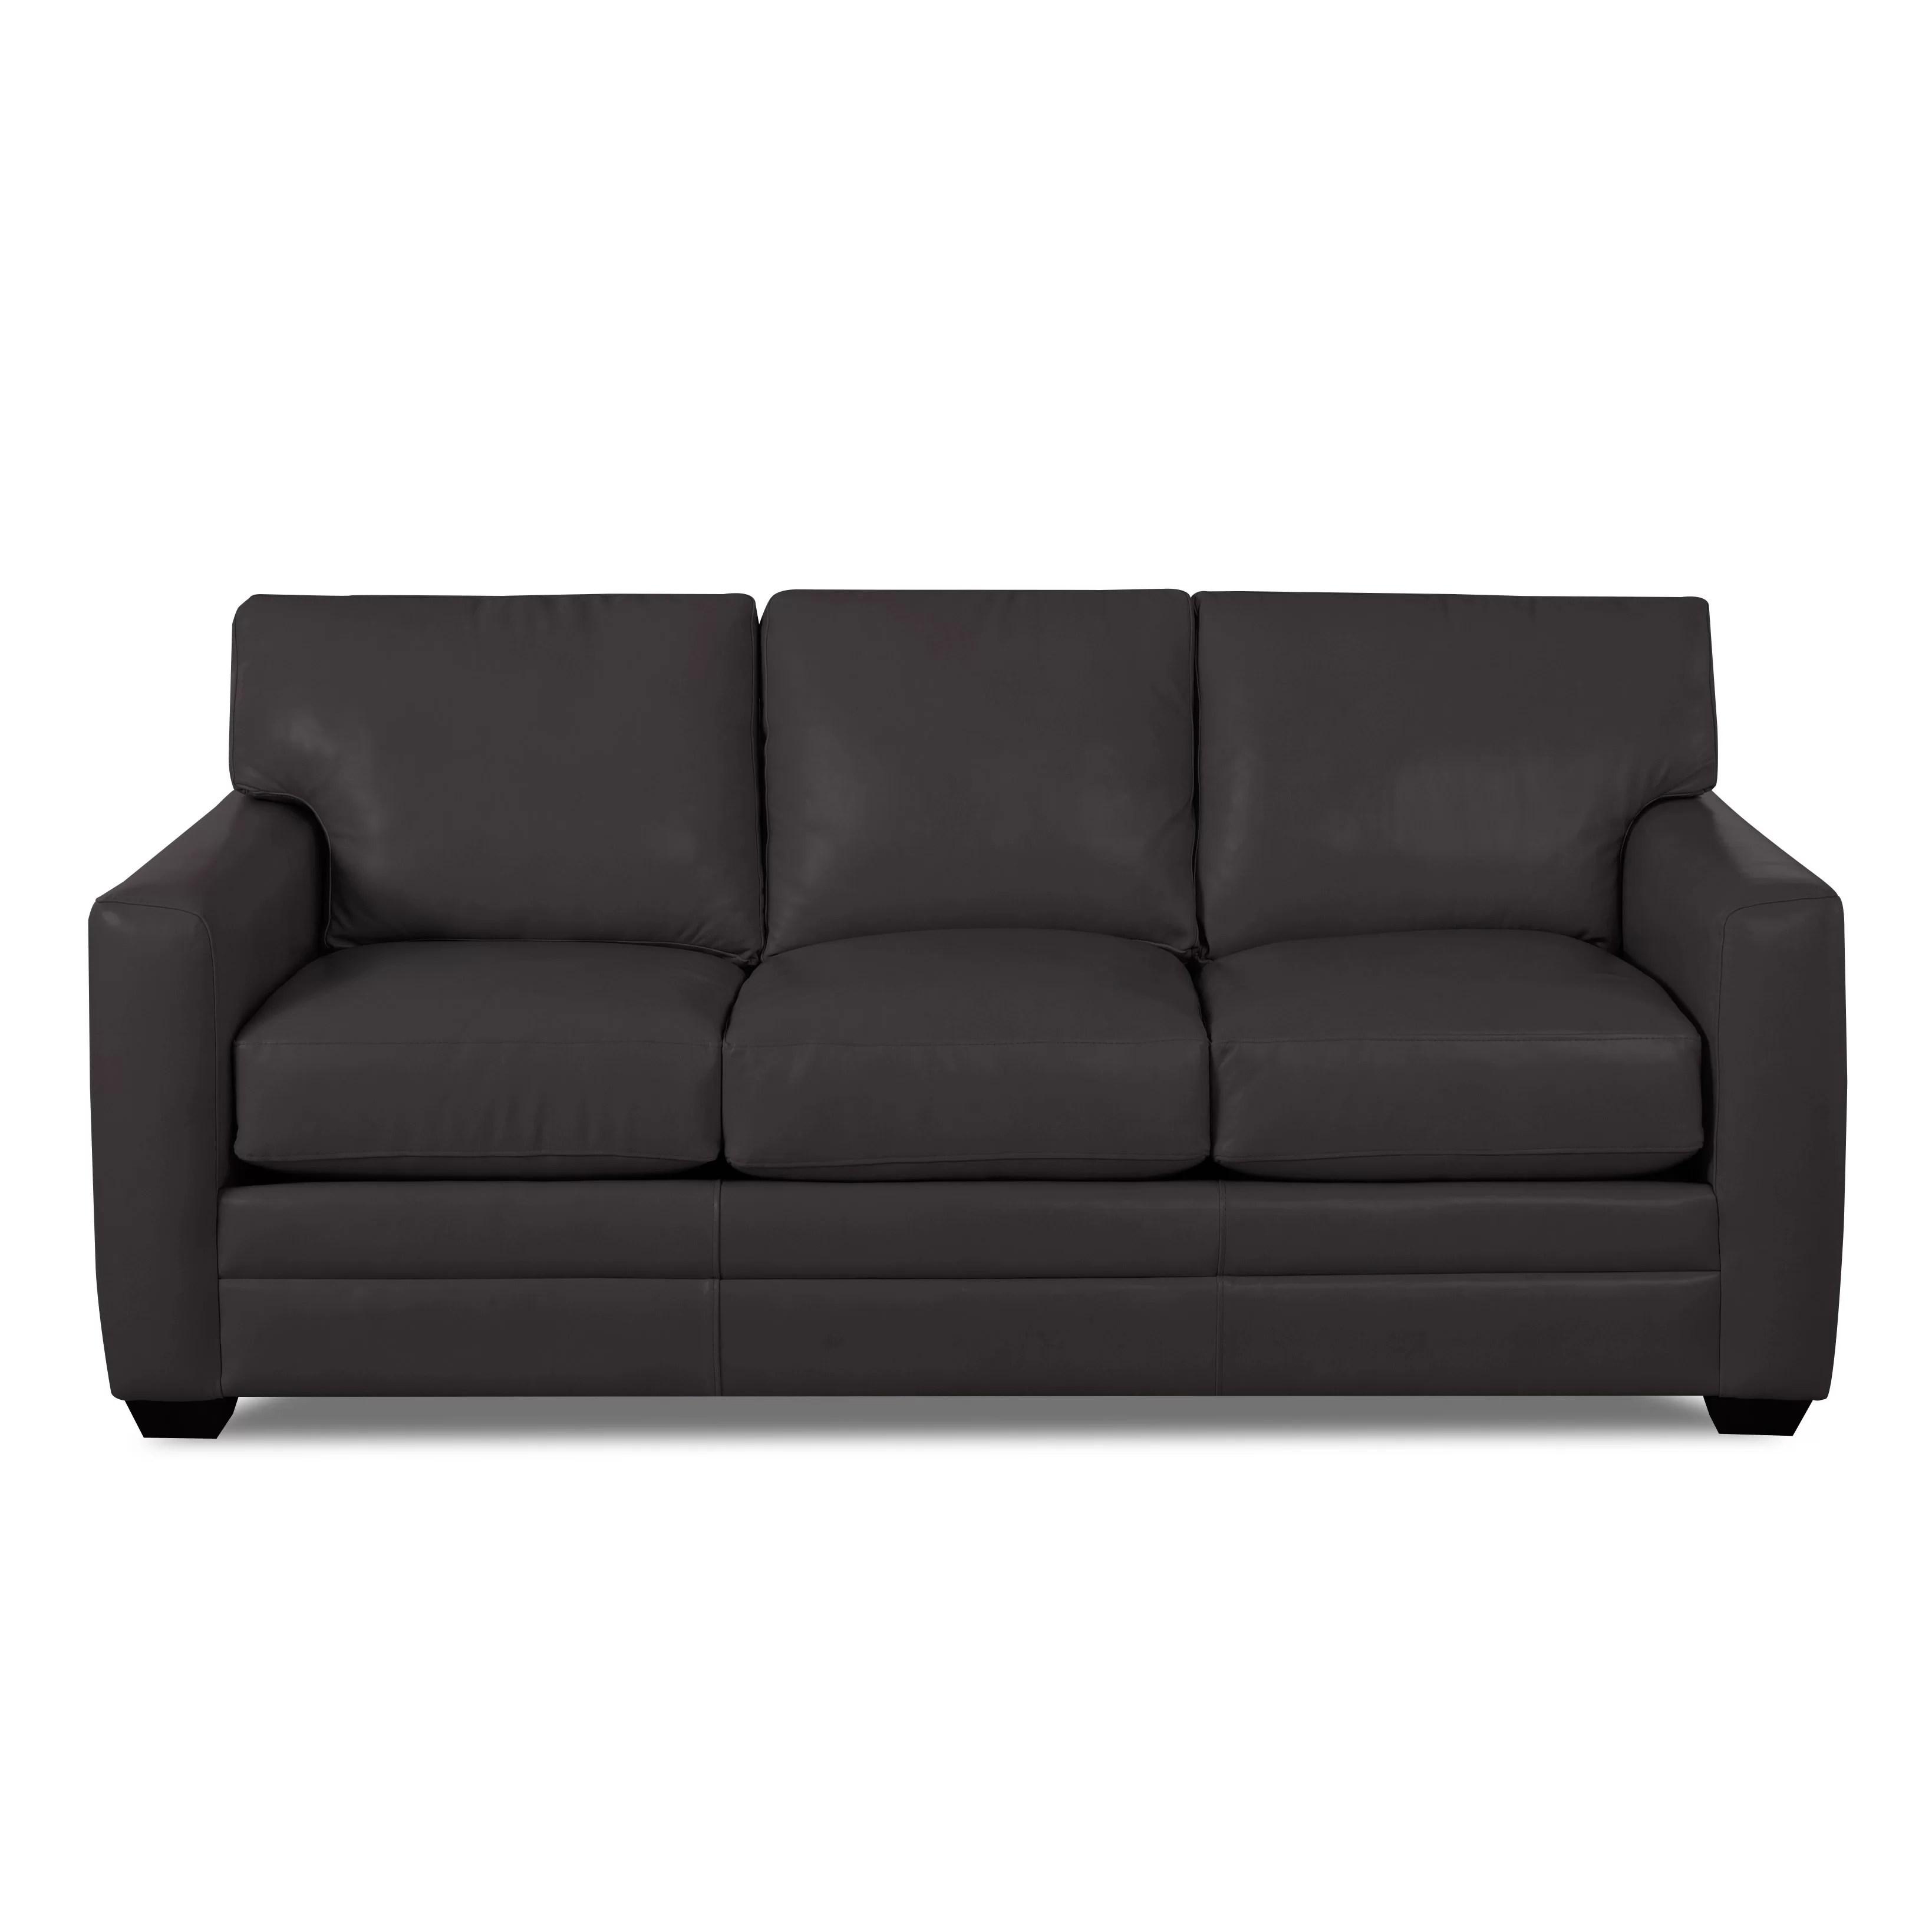 wayfair sofas reviews sofa glides for carpet custom upholstery carleton leather and